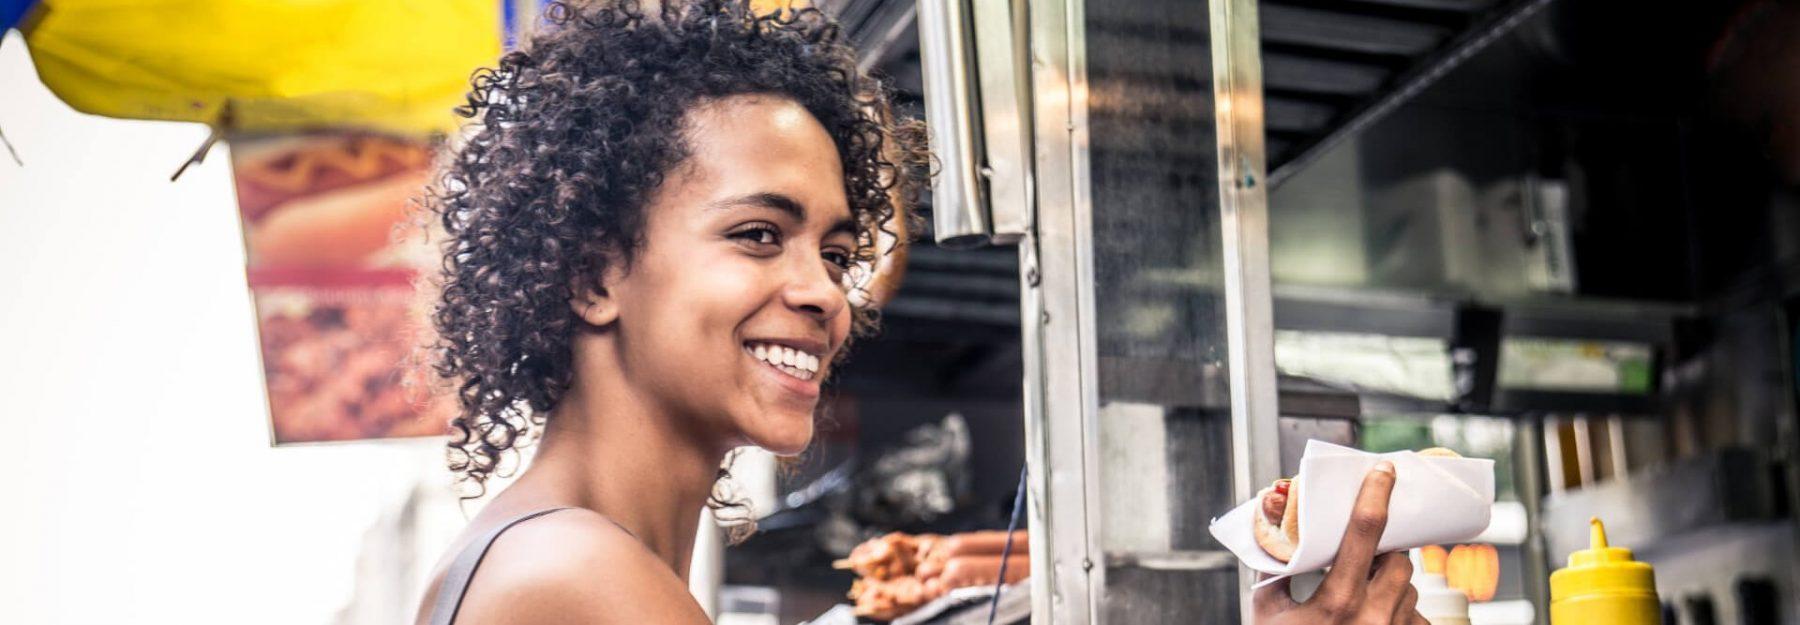 Viaggio a New York Street Food